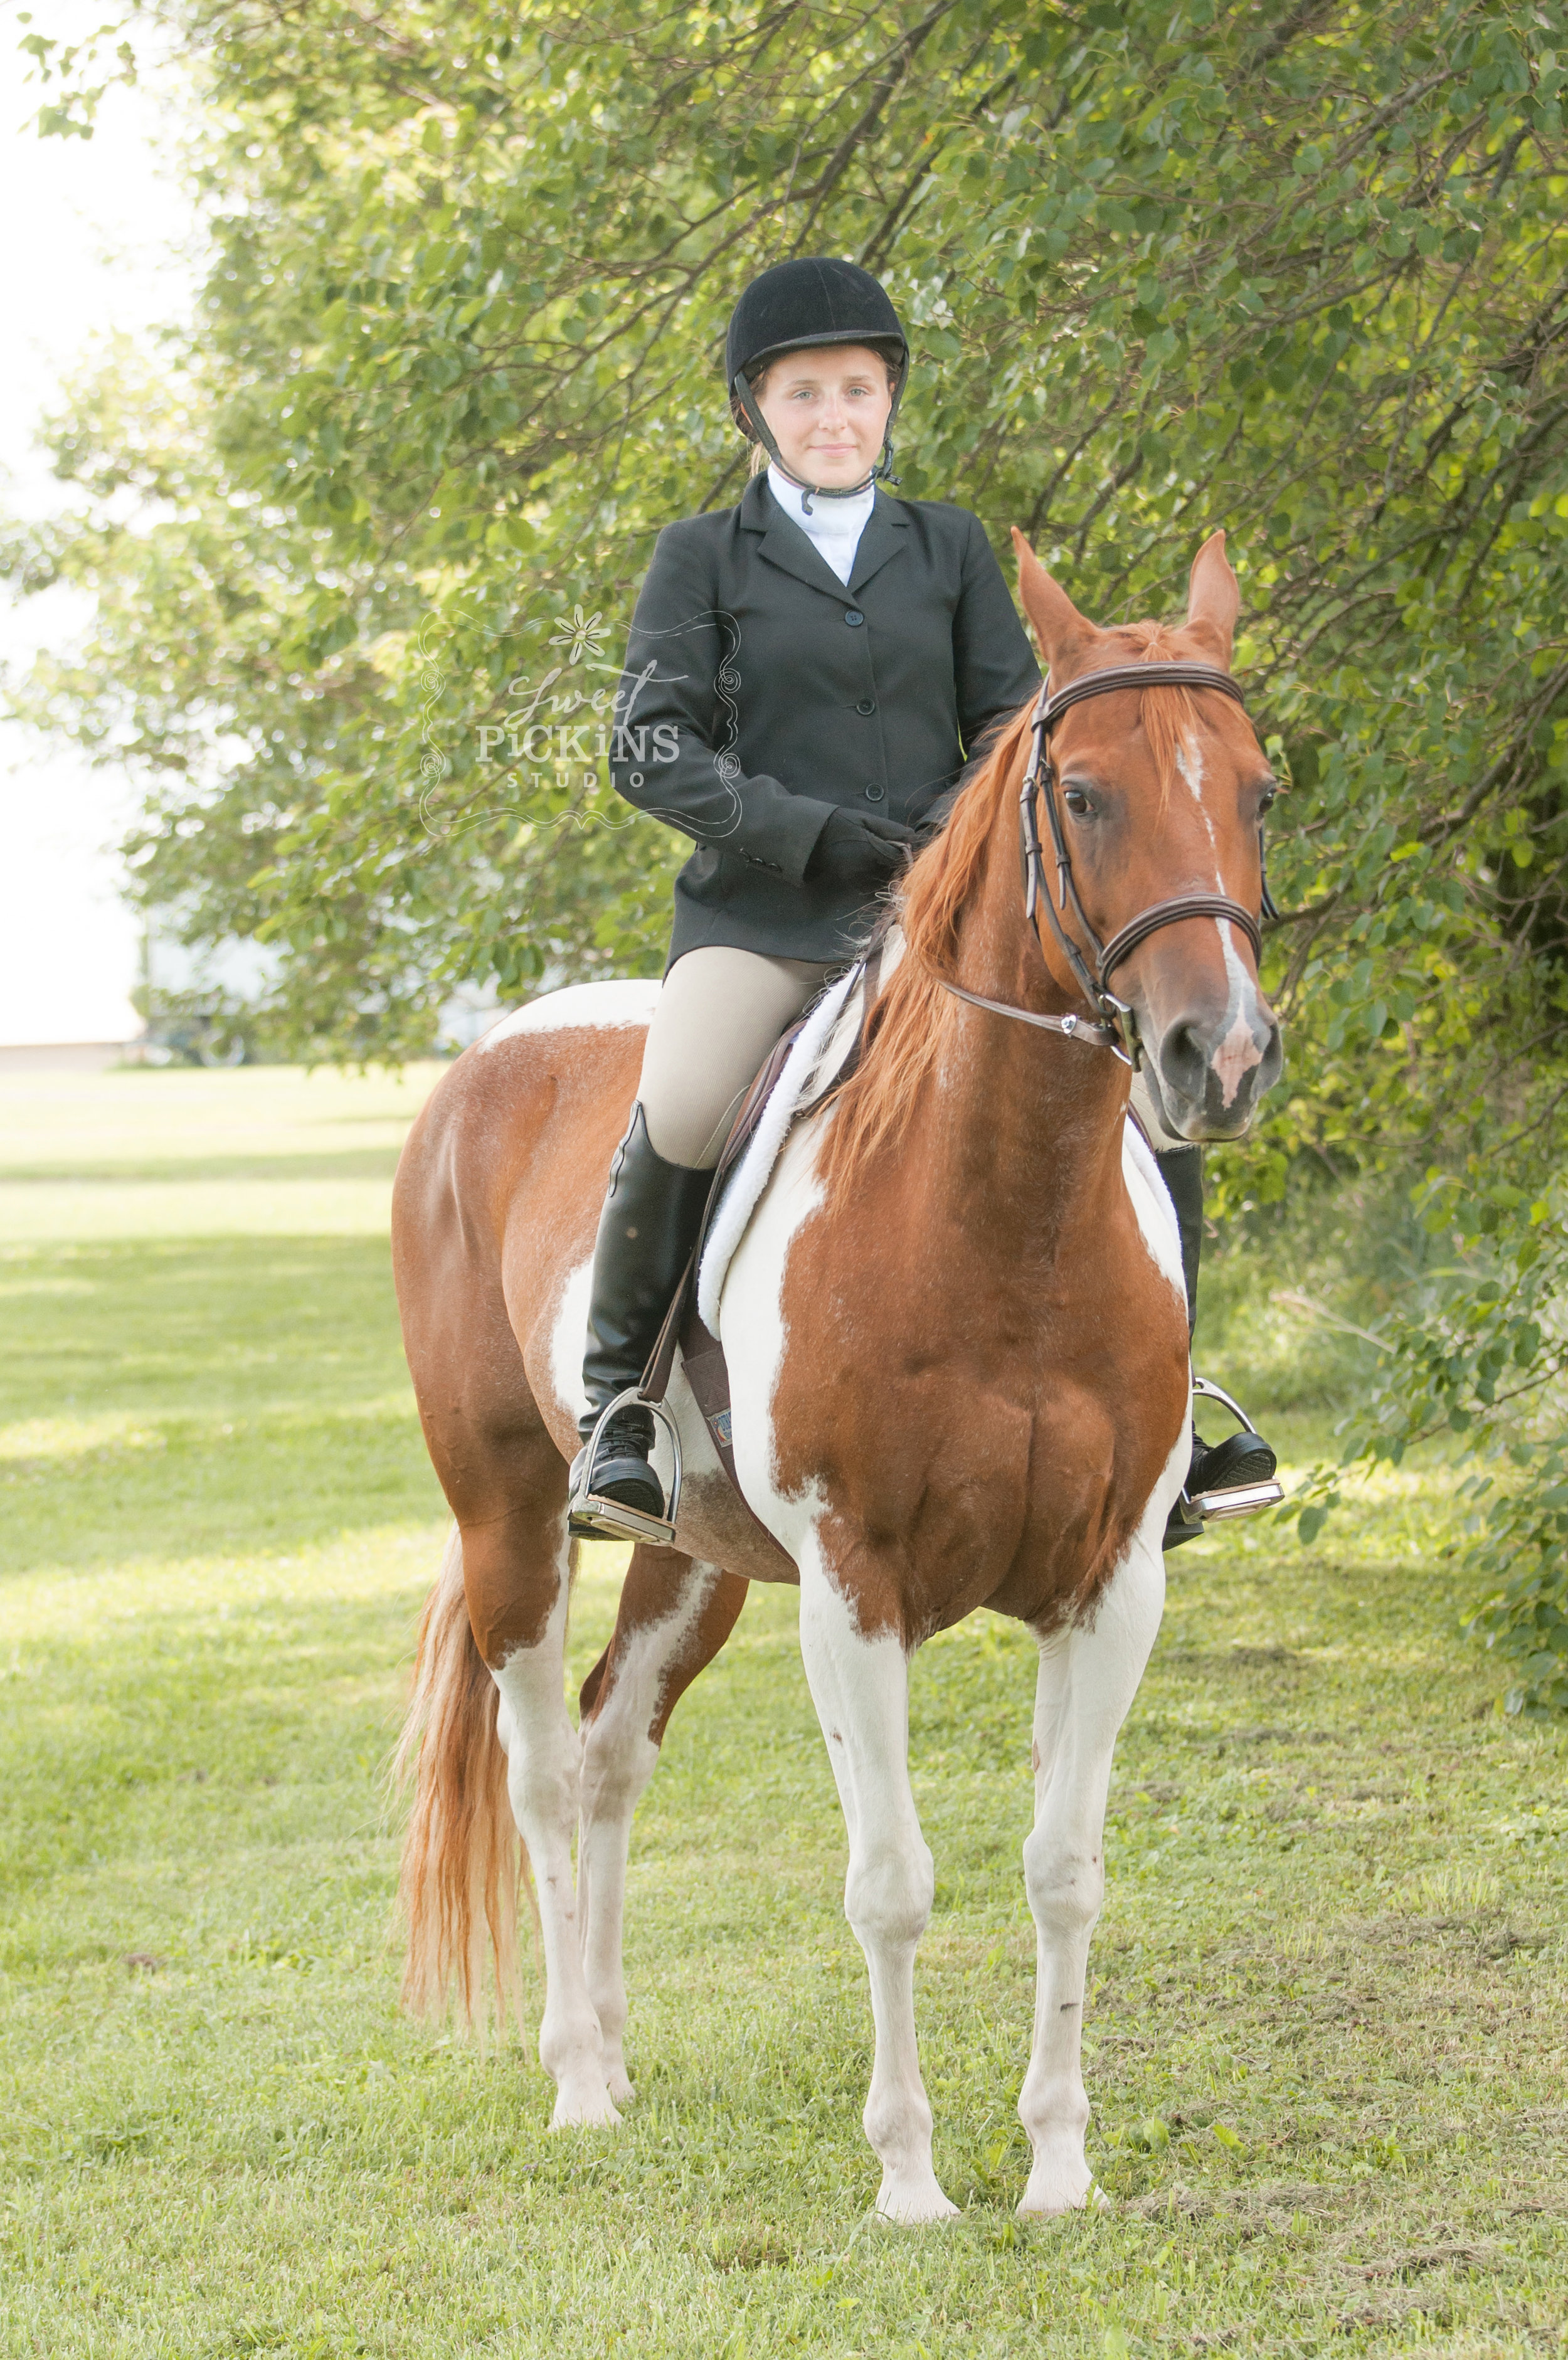 Equine Horse Portrait Photographer   Sweet Pickins Studio